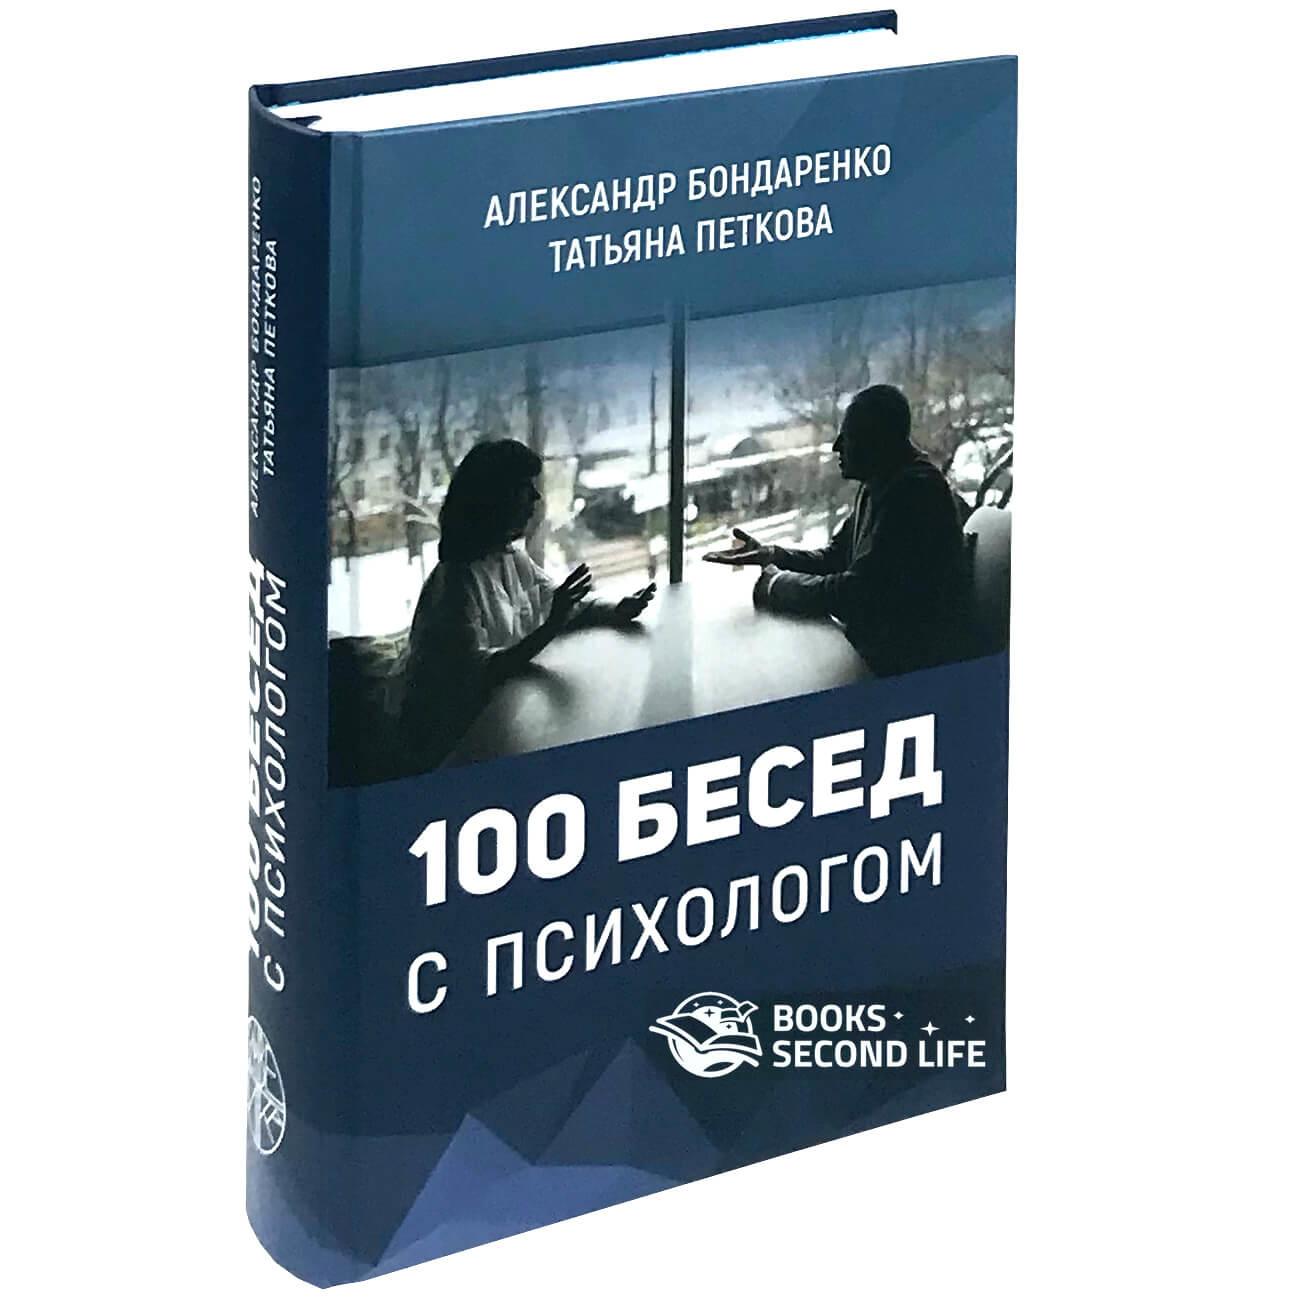 100 бесед с психологом (2-е издание). Александр Бондаренко, Татьяна Петкова . Автор — Александр Бондаренко, Татьяна Петкова.